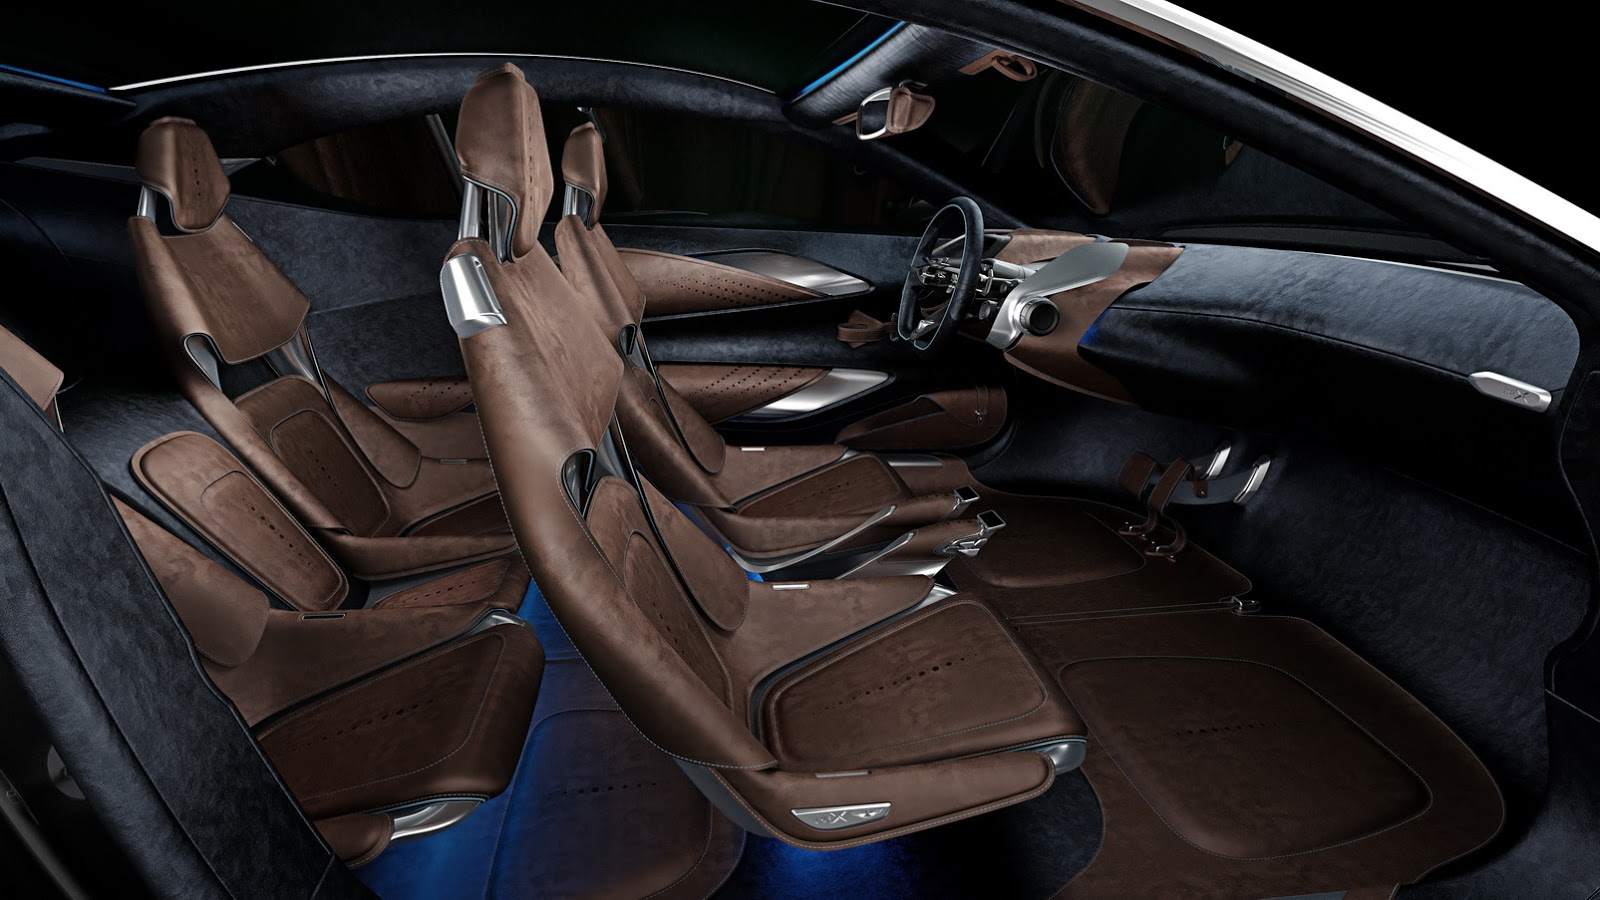 Aston Martin SUV launch